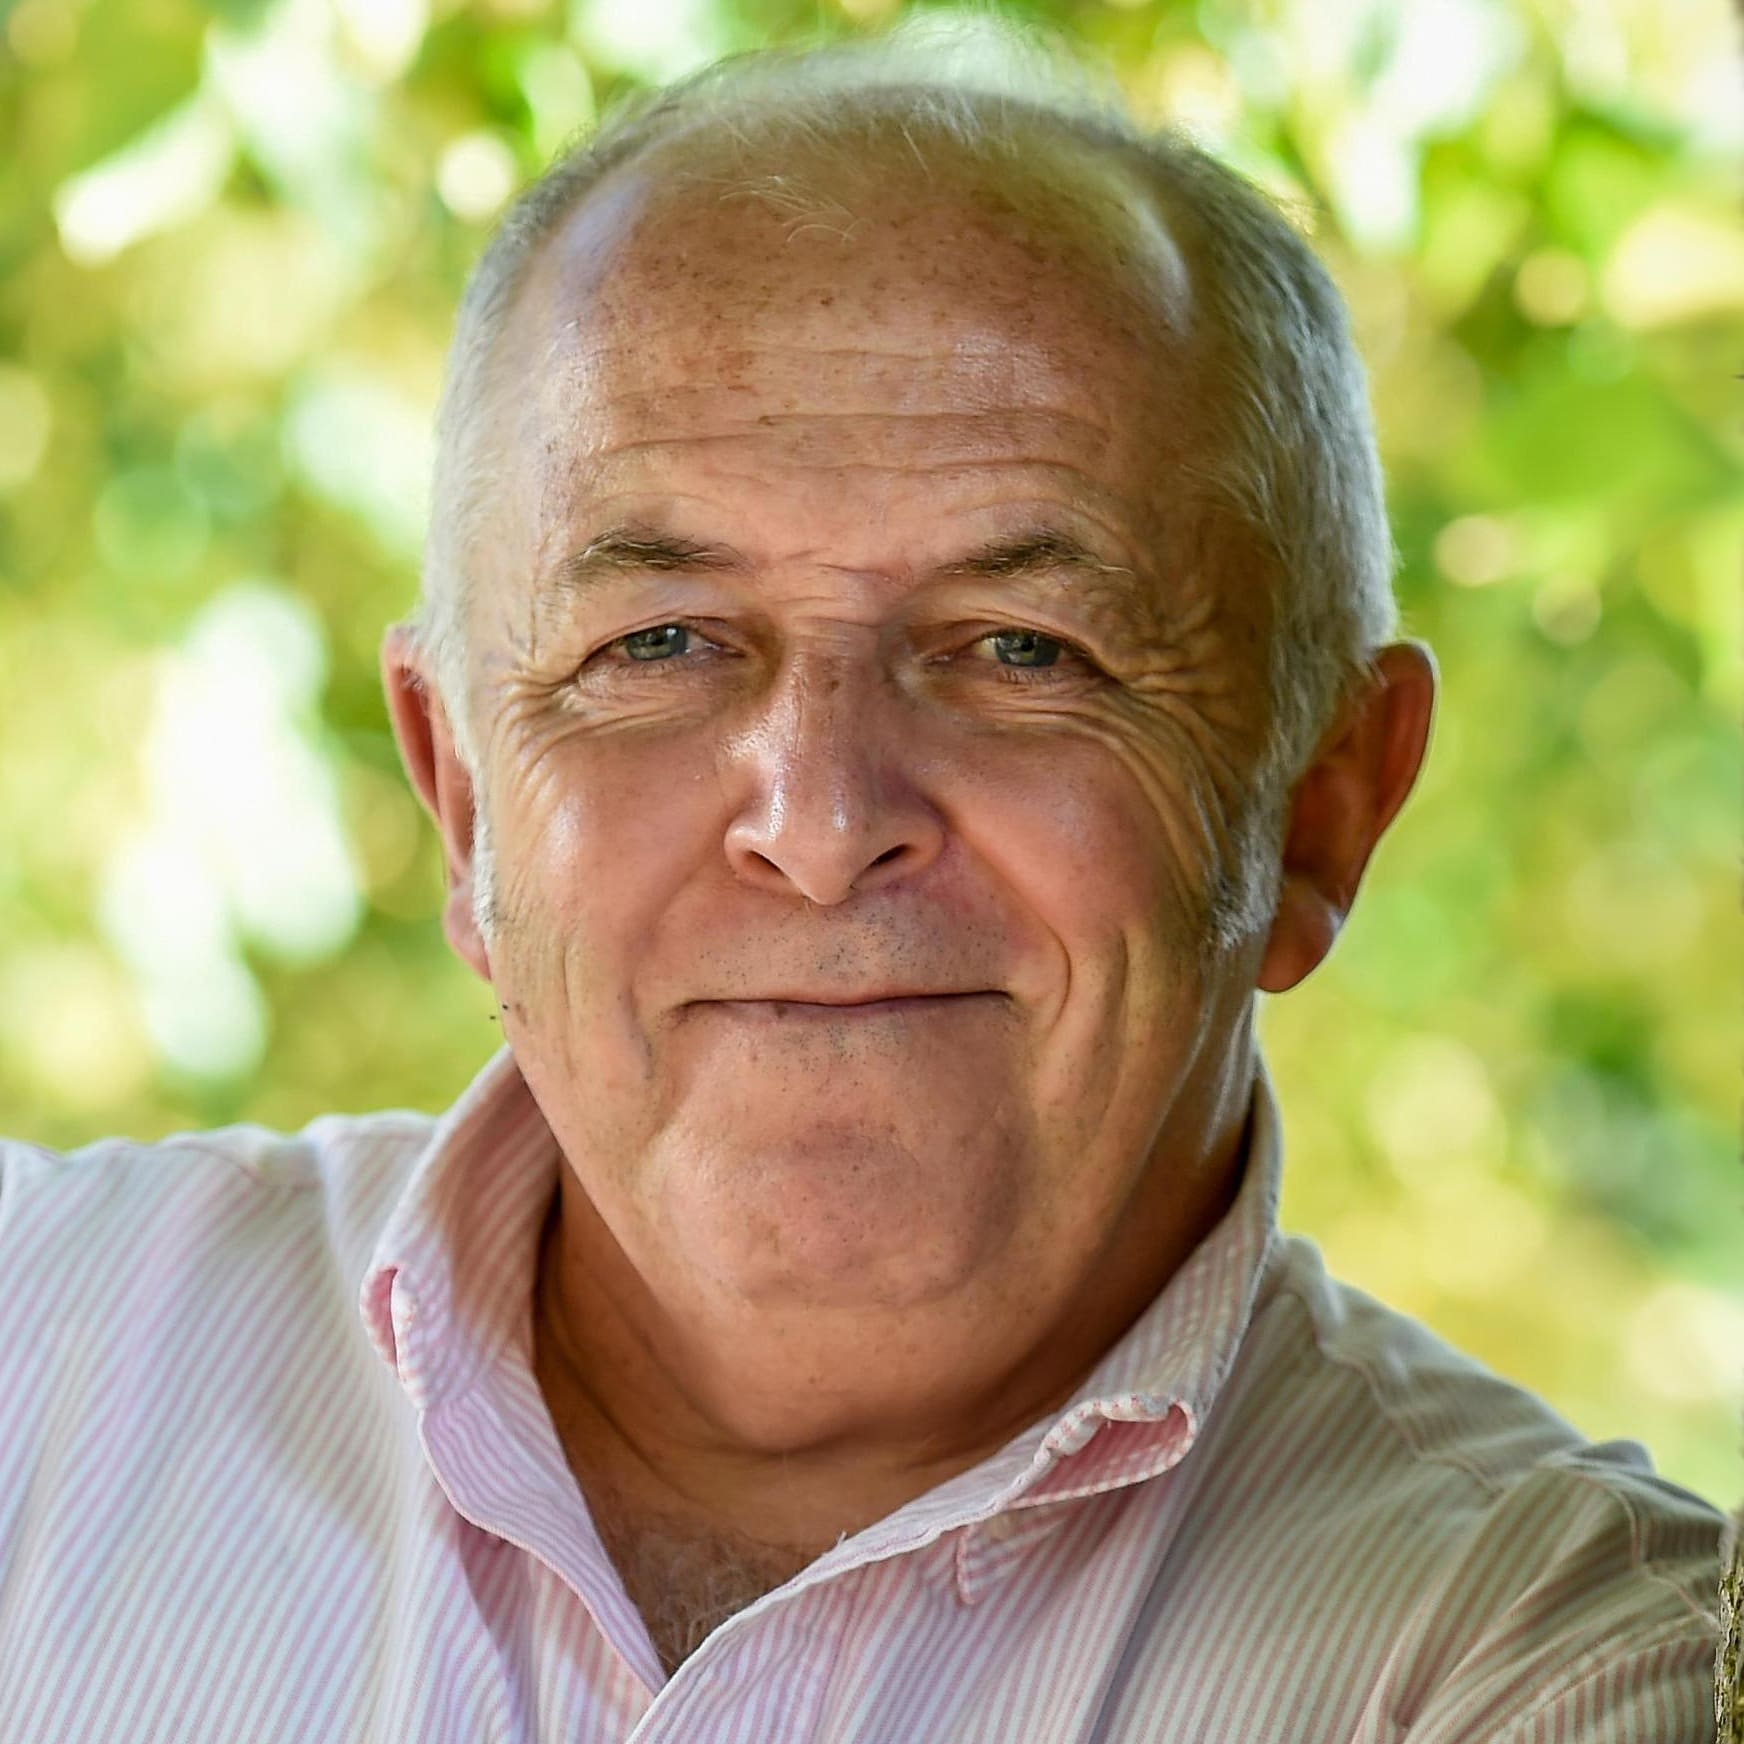 Jeremy Bowen BBC Middle East Editor reporter journalist bowel cancer speaker at Great British Speakers